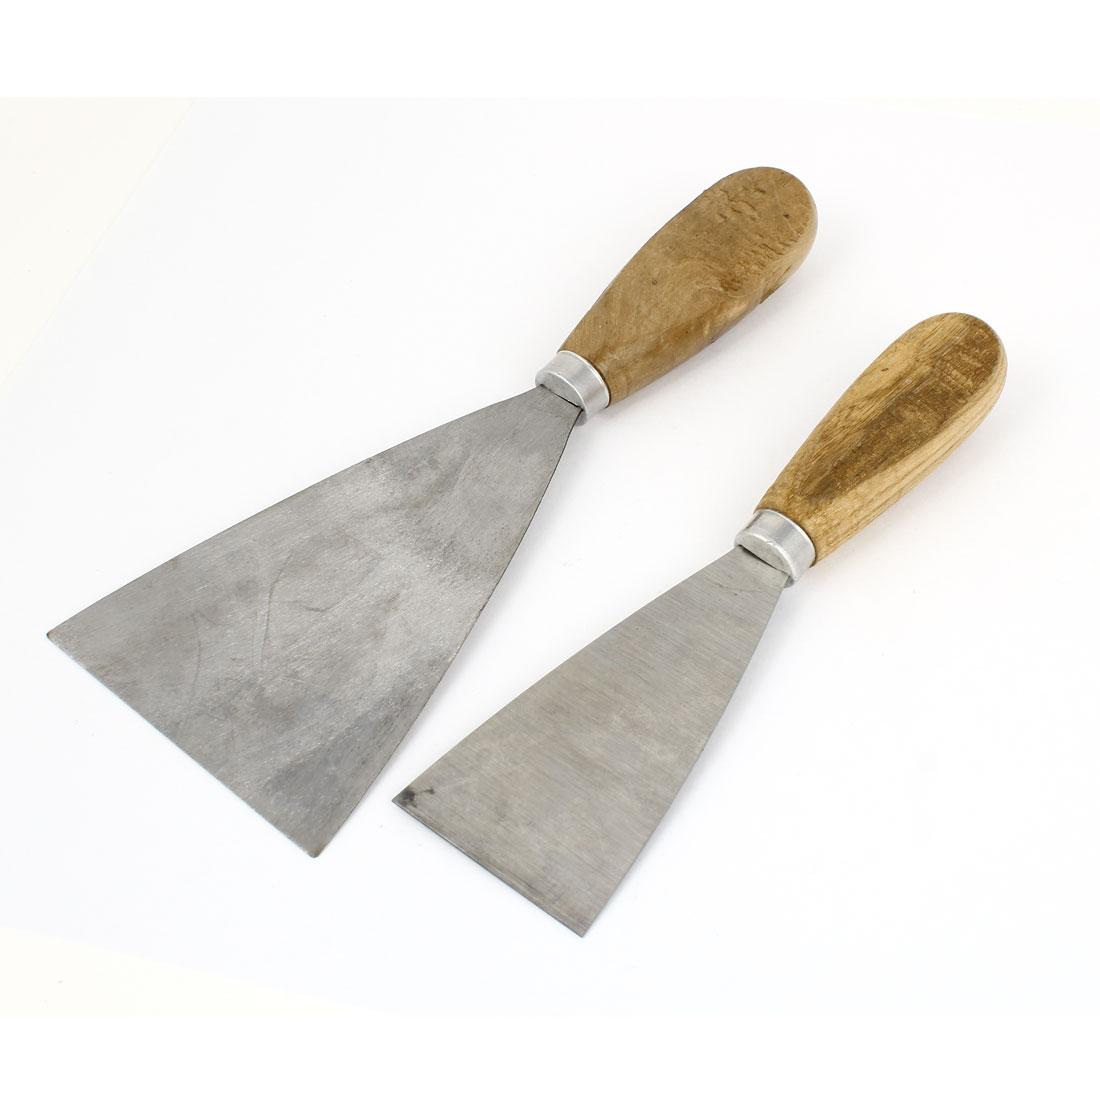 "2pcs 2"" 3.5"" Width Metal Blade Wooden Handle Drywall Repair Putty Scraper"